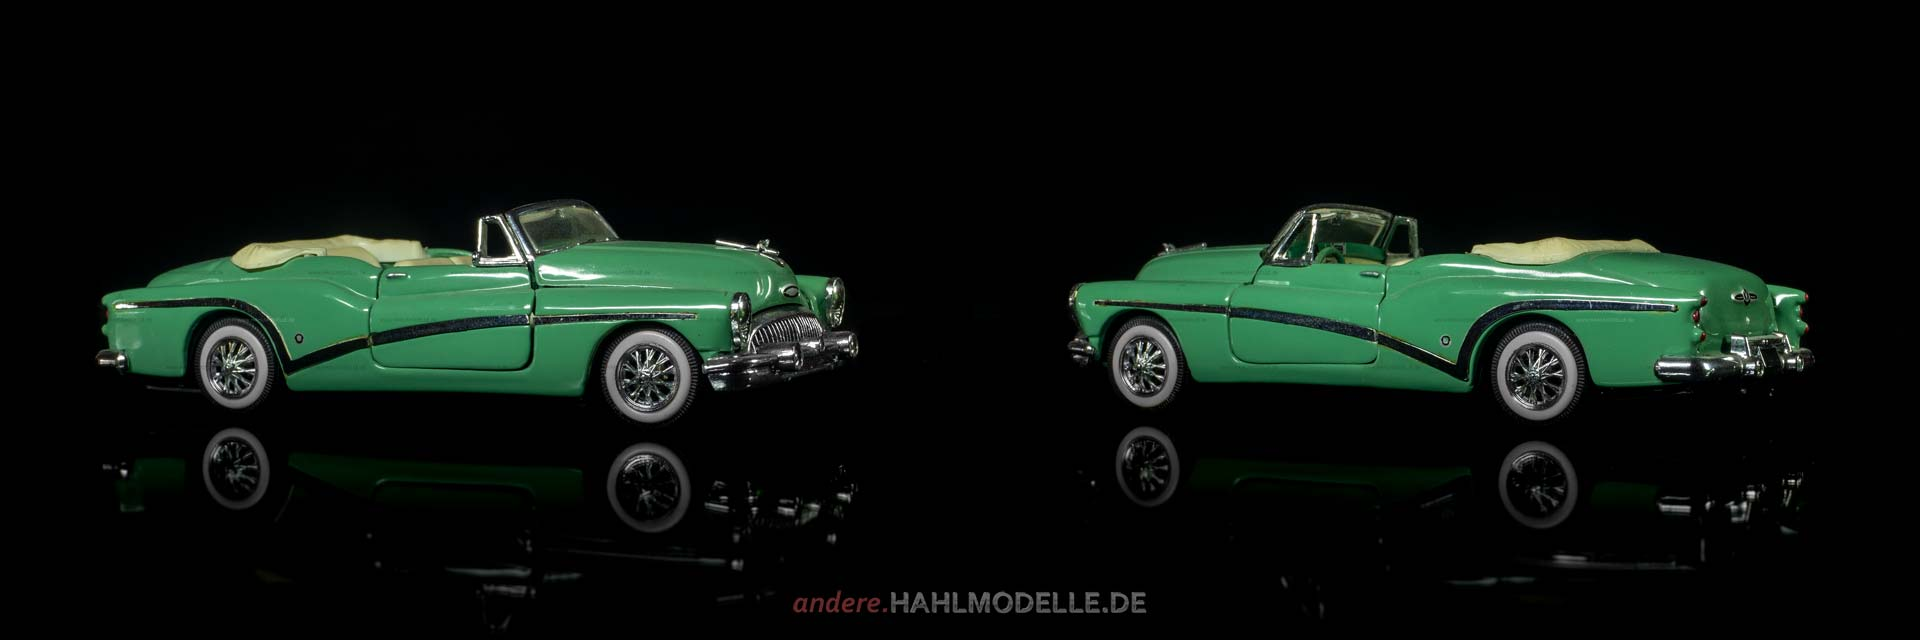 Buick Serie 70 Skylark Convertible Coupé | Cabriolet | Franklin Mint Precision Models | 1:43 | www.andere.hahlmodelle.de